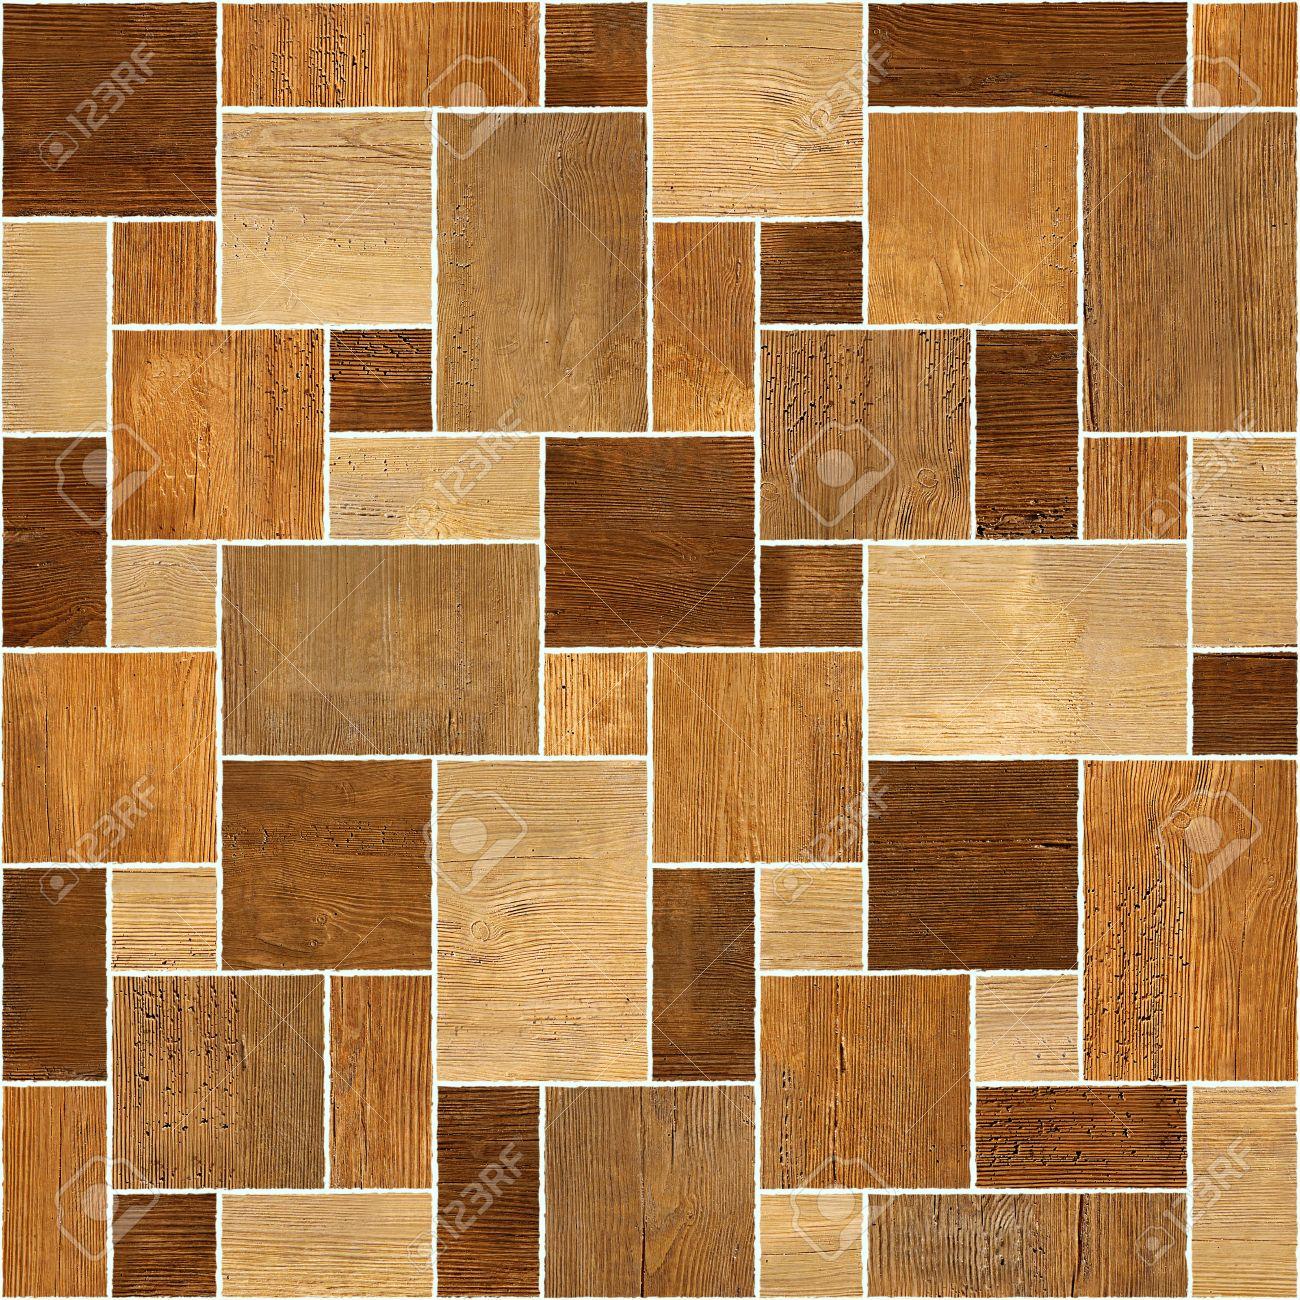 Paneles De Madera Para Paredes Awesome Paneles De Madera Natural  ~ Panelados De Madera Para Paredes